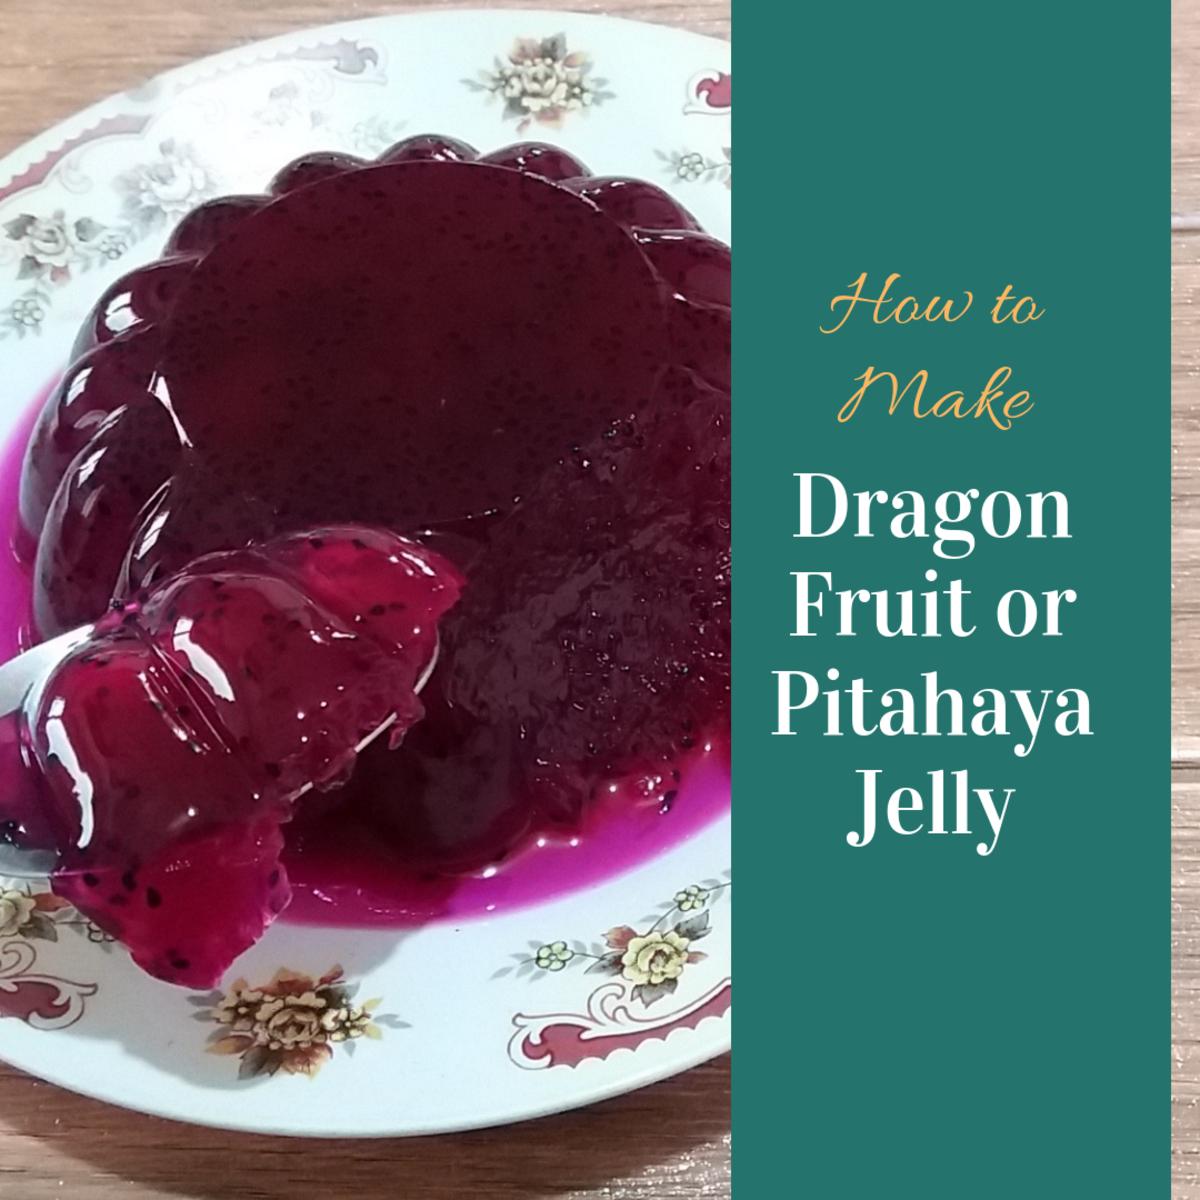 How to Make Dragon Fruit (Pitahaya) Jelly